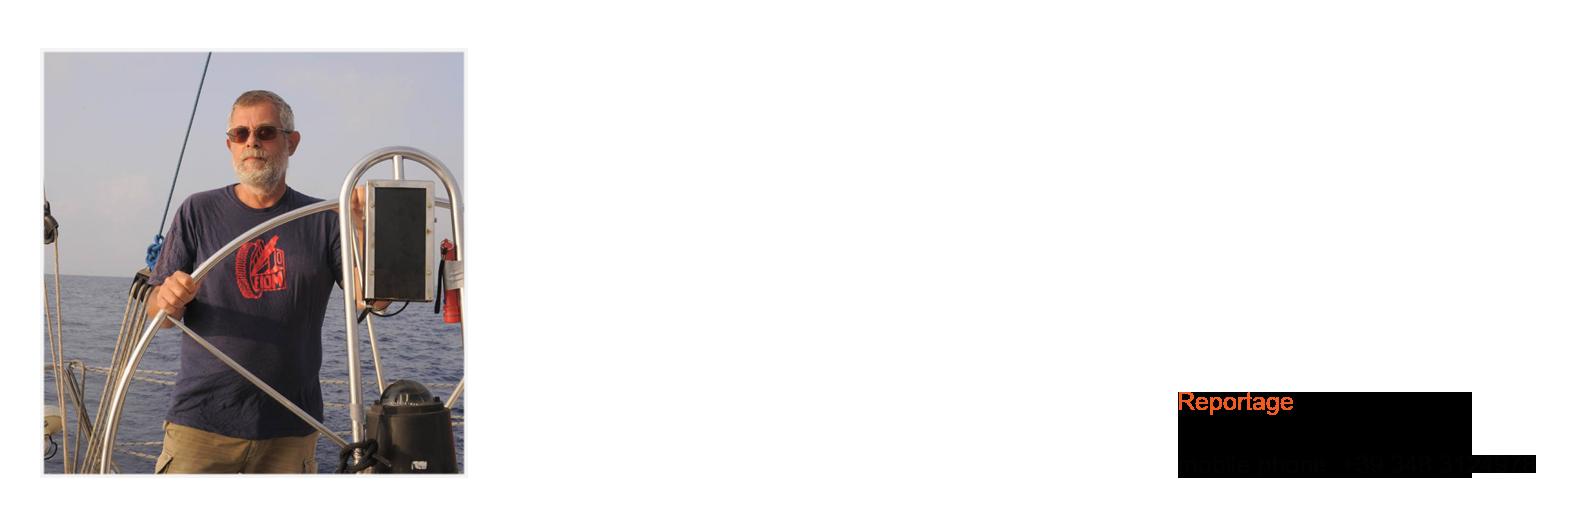 dinopng